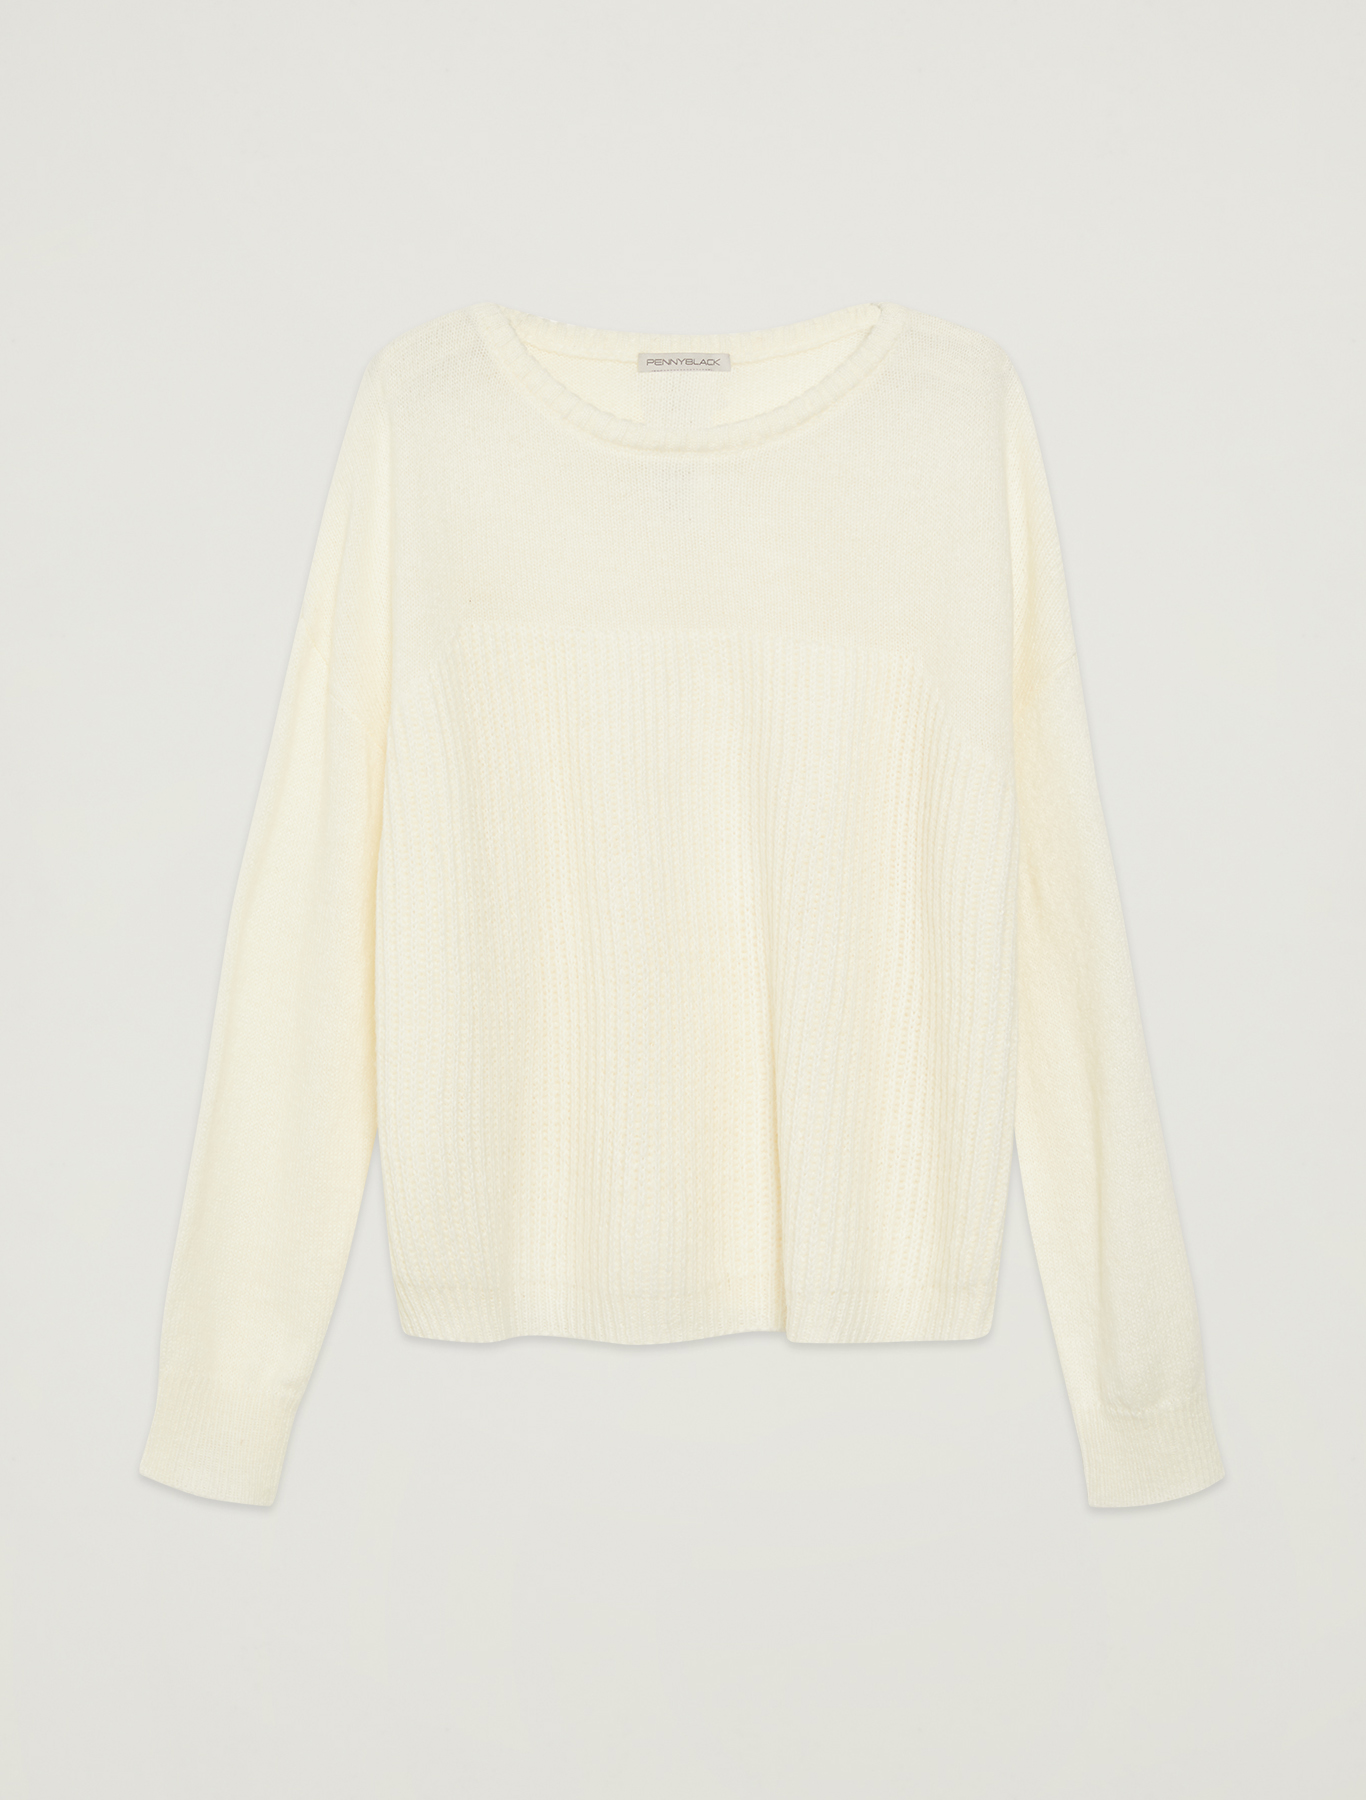 English rib knit jumper - white - pennyblack